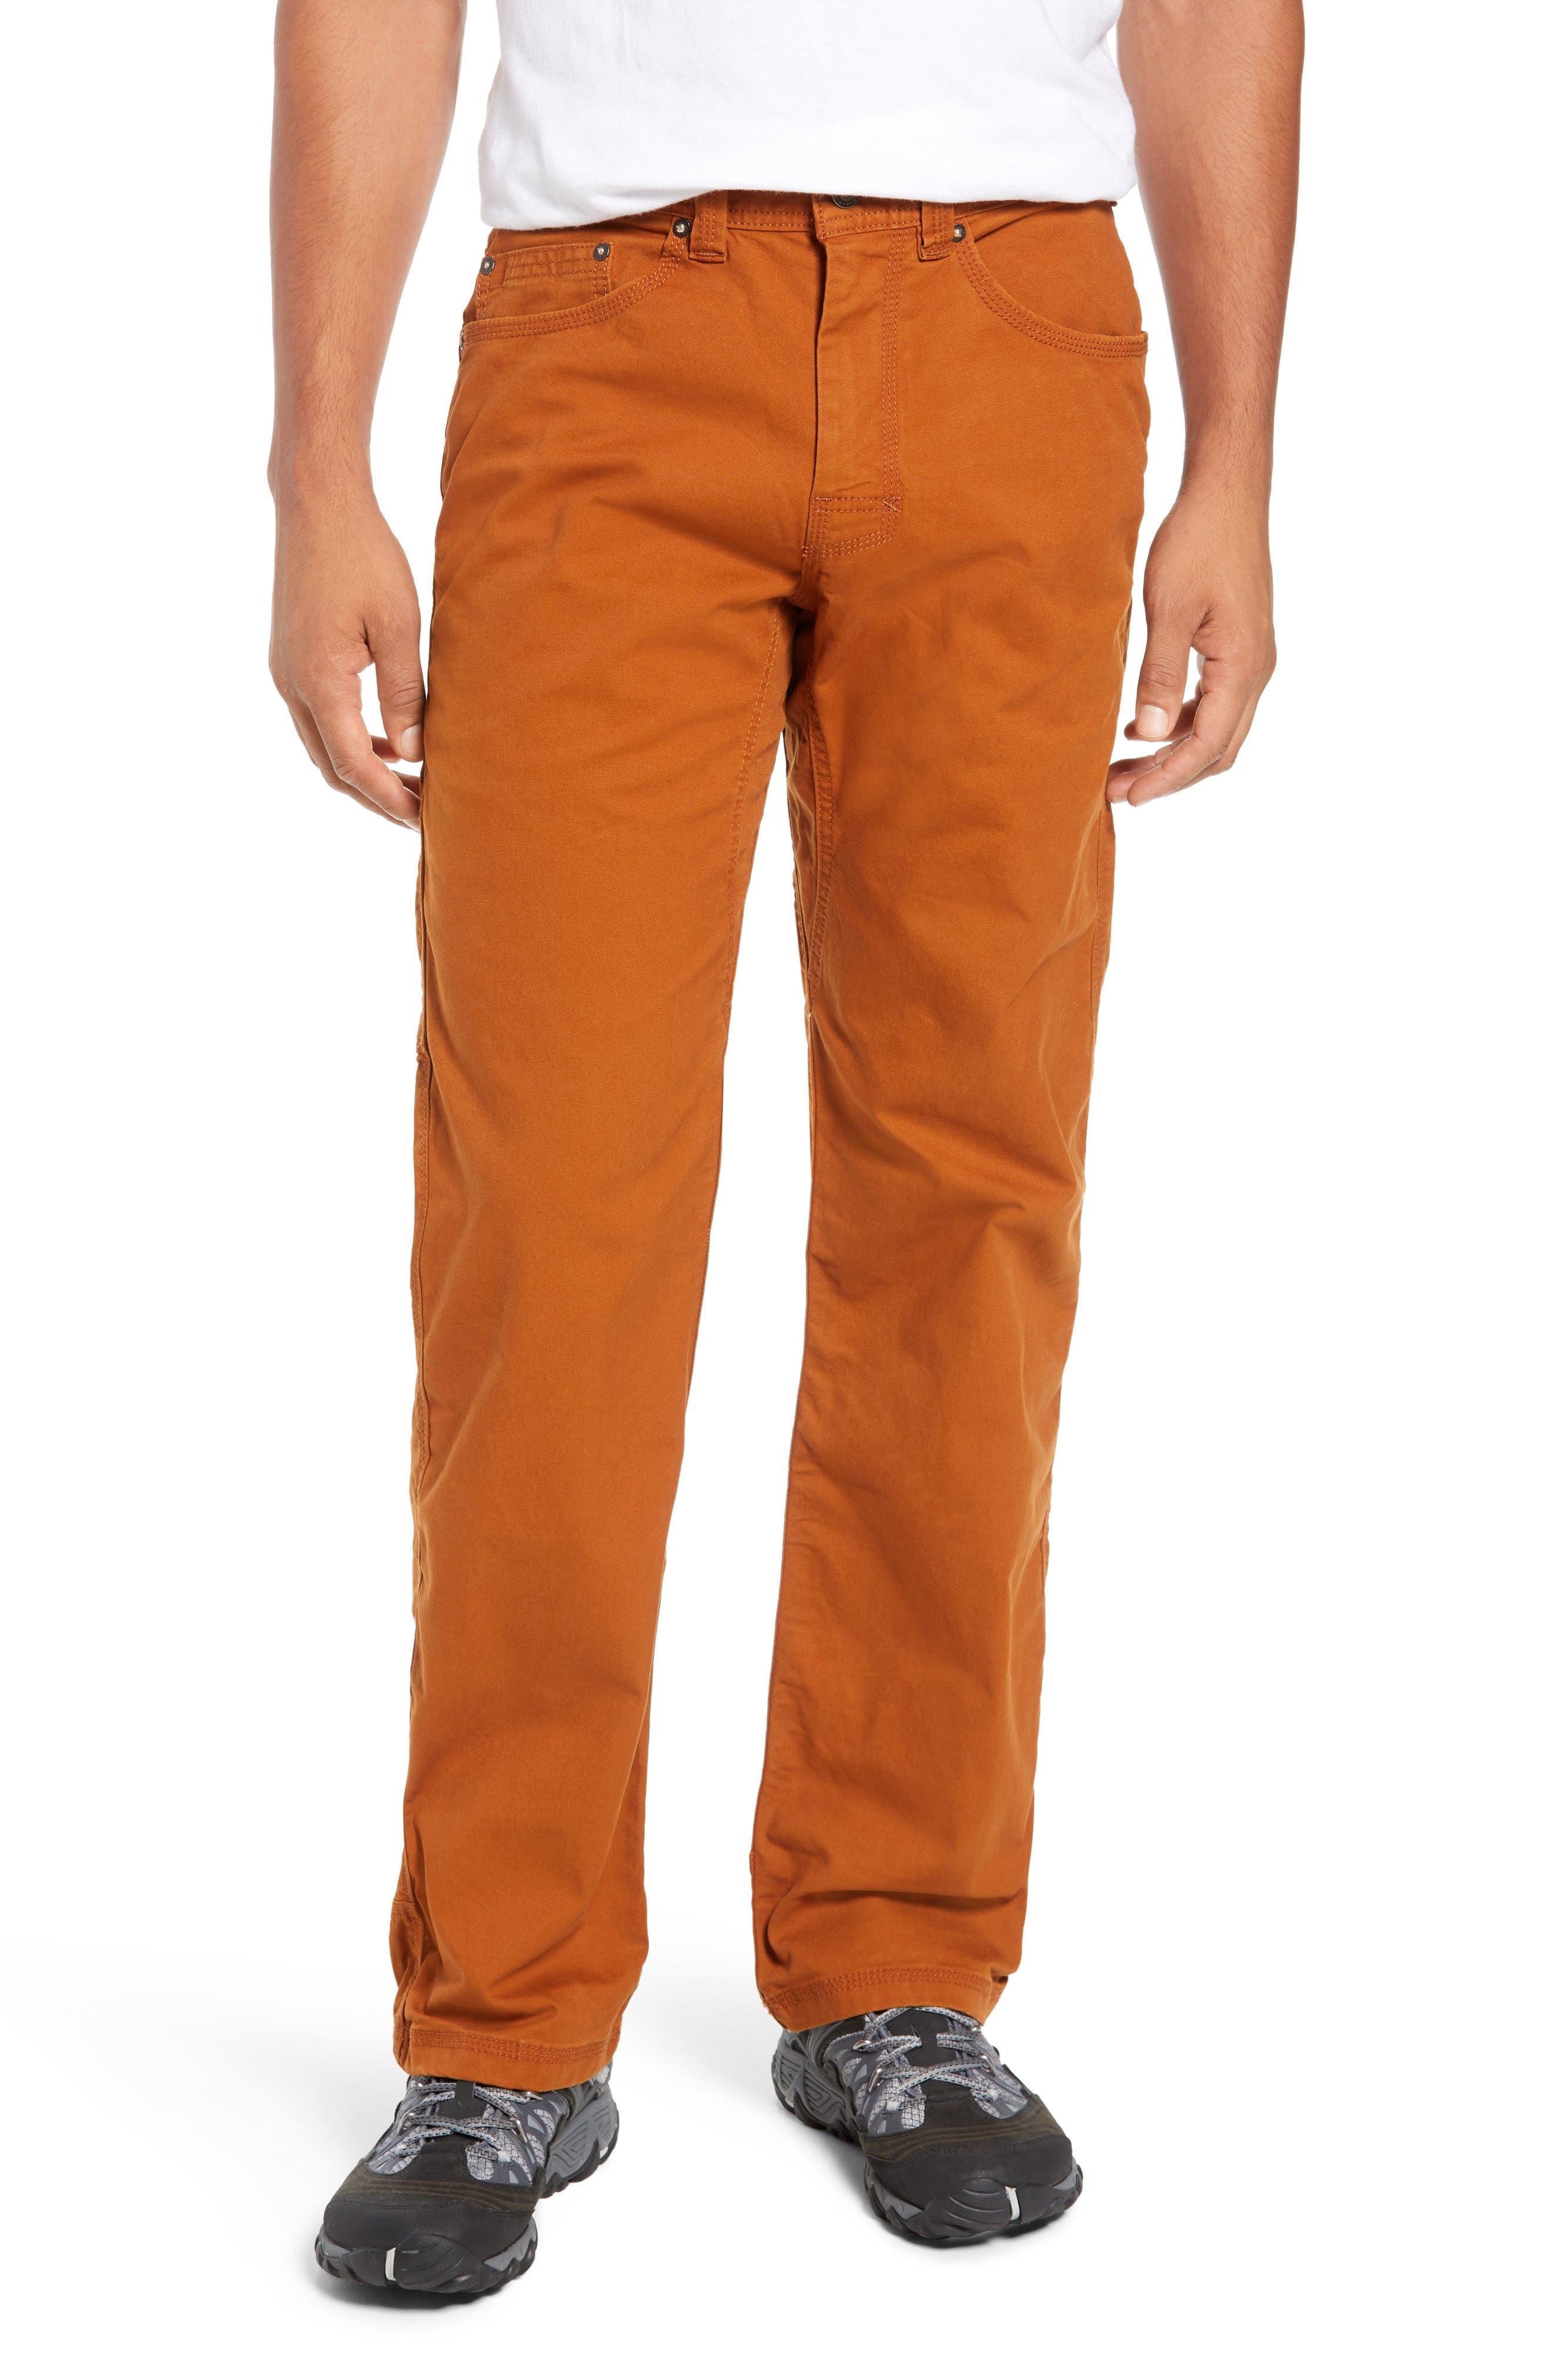 Bronson Pants,                             Main thumbnail 1, color,                             BURNT CARAMEL